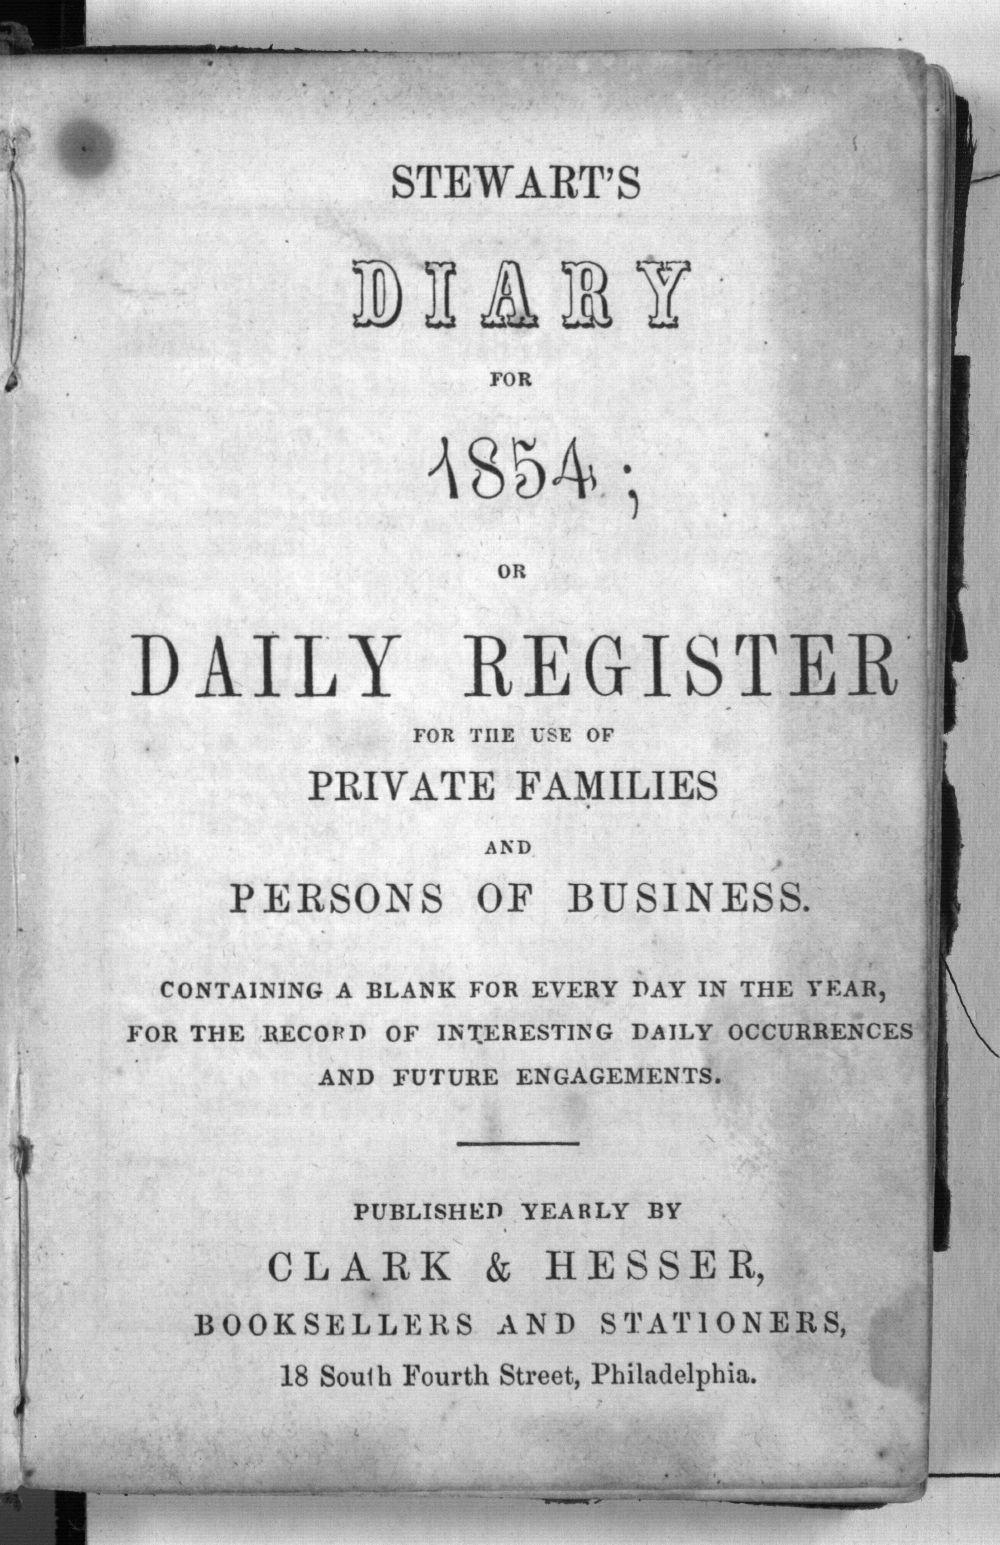 Dandridge E. Kelsey's 1854 diary - Title Page